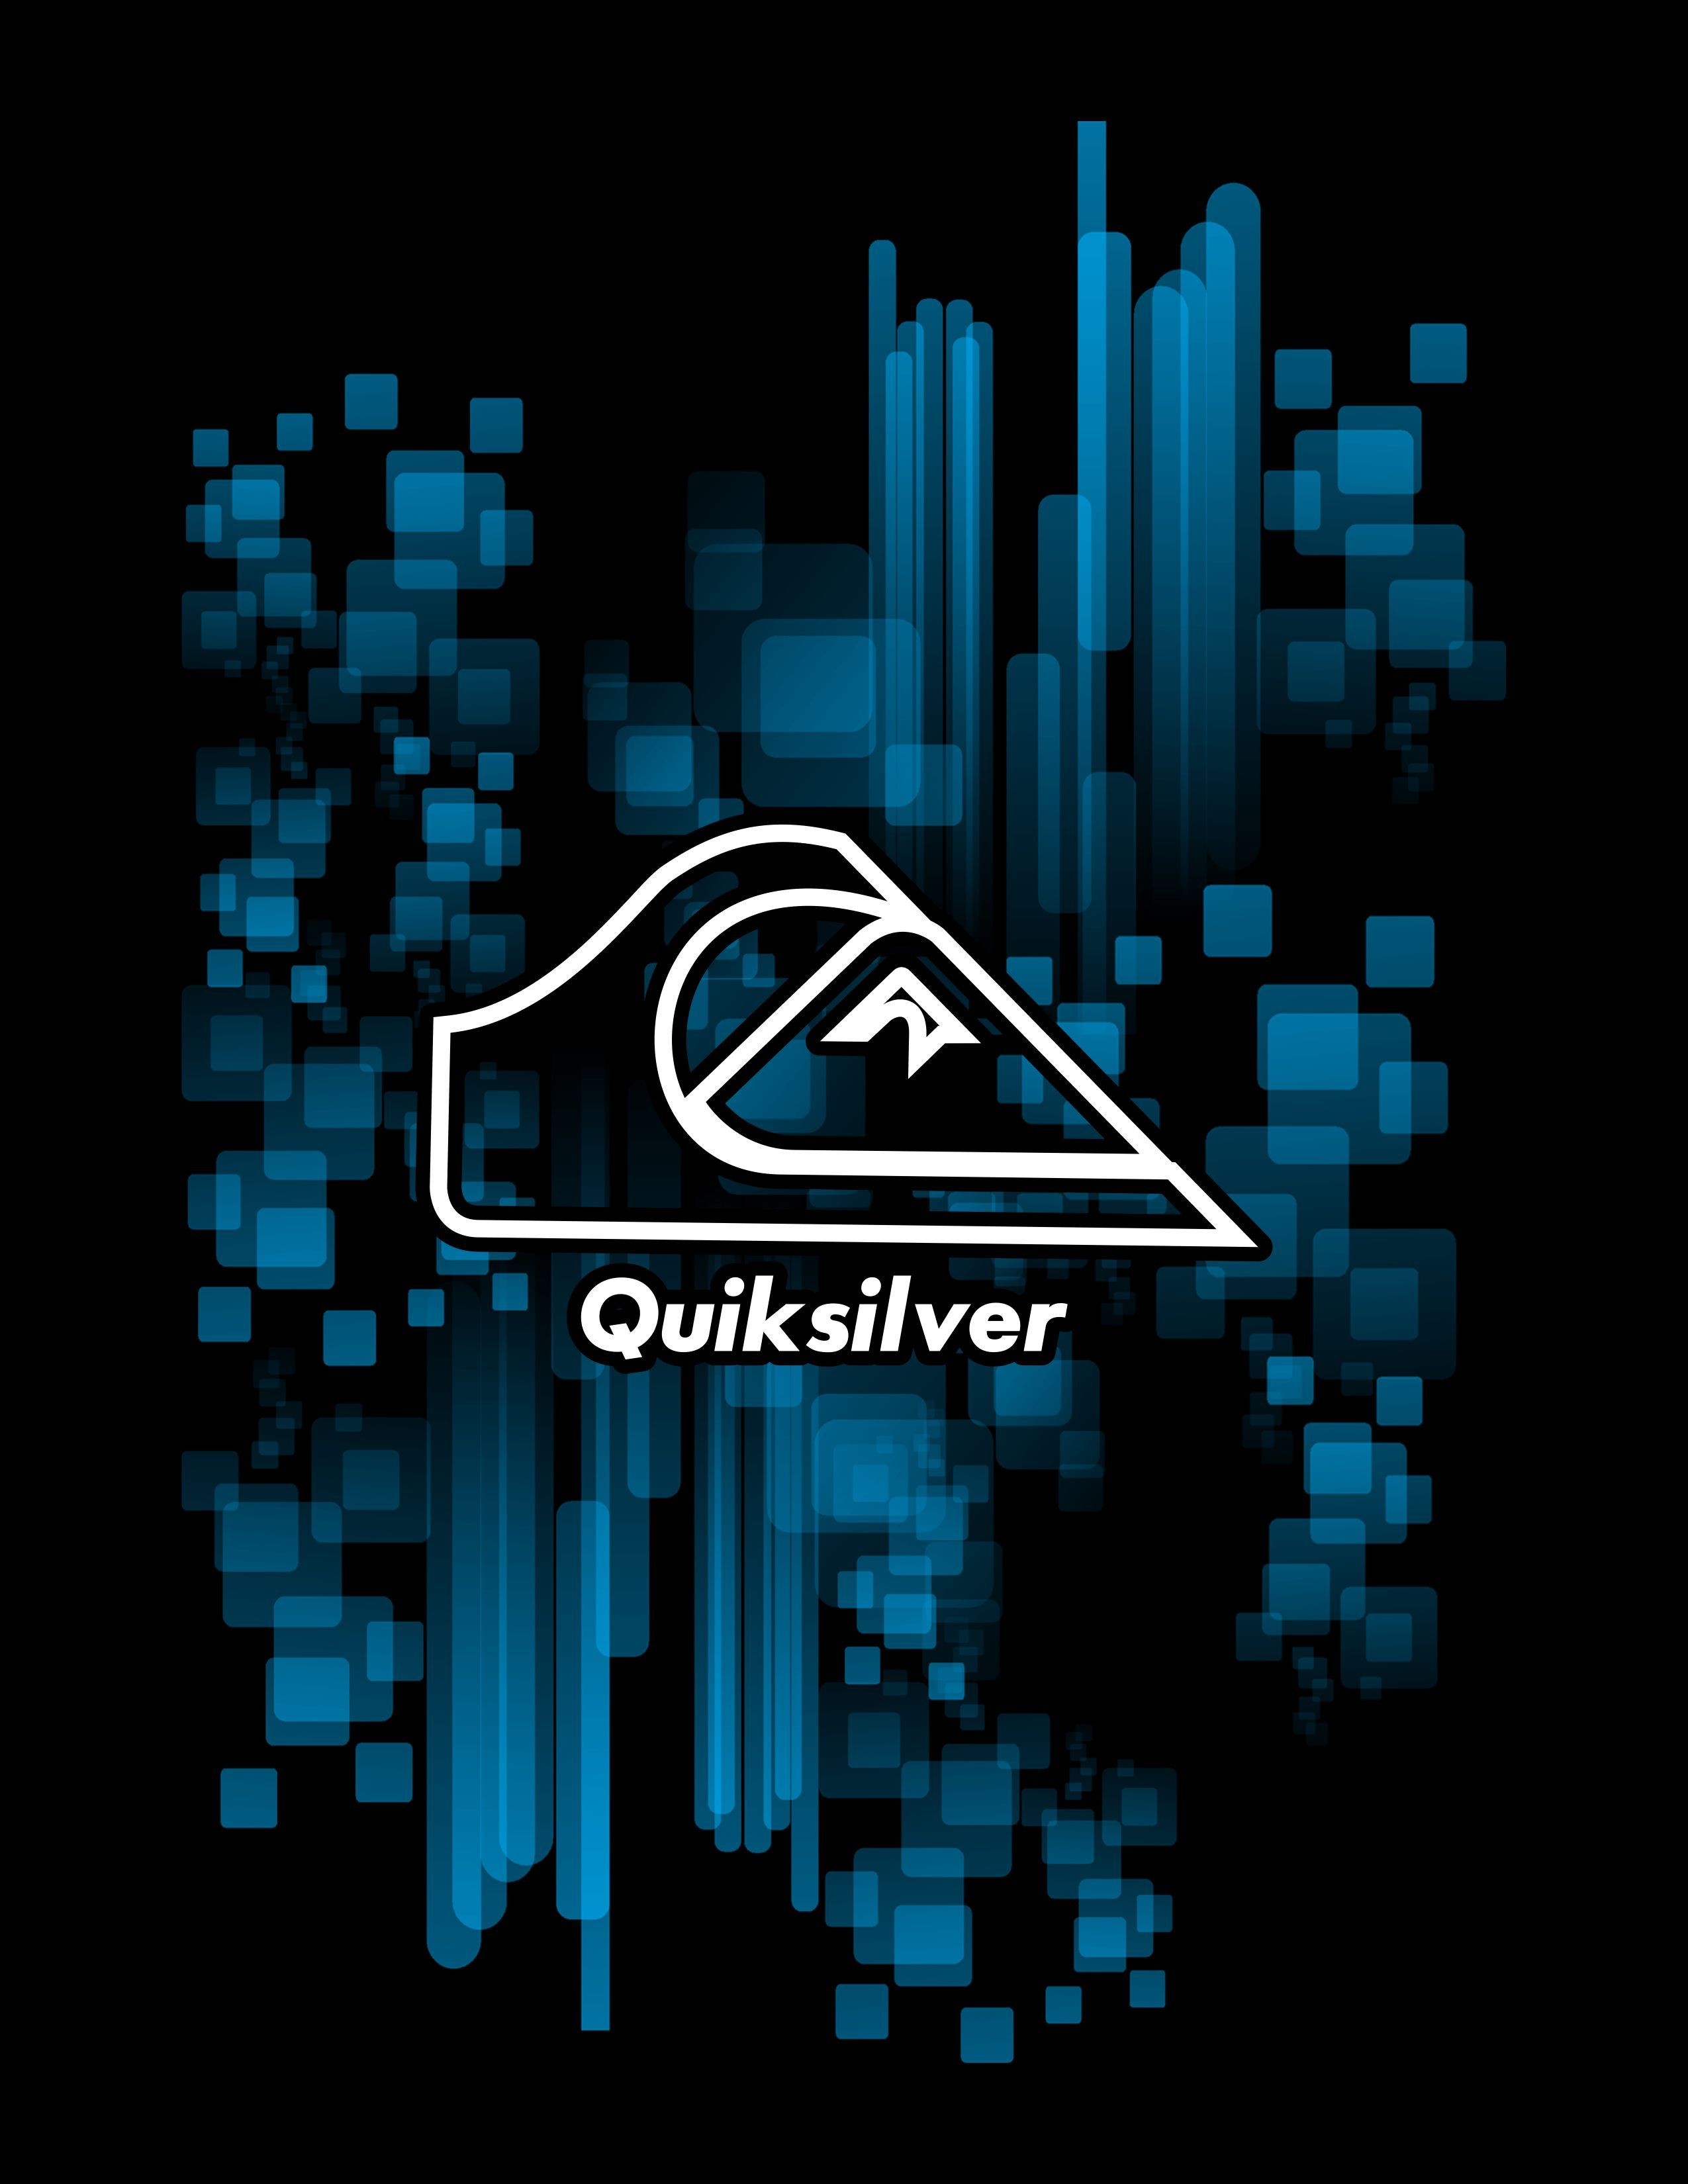 Levis Underarmour Adidas Nike Quiksilver Ripcurl Hurley Dc Volcom Oakley Spyderbilt Arte Adesivo De Parede Logotipo De Surfe Papel De Parede Da Nike